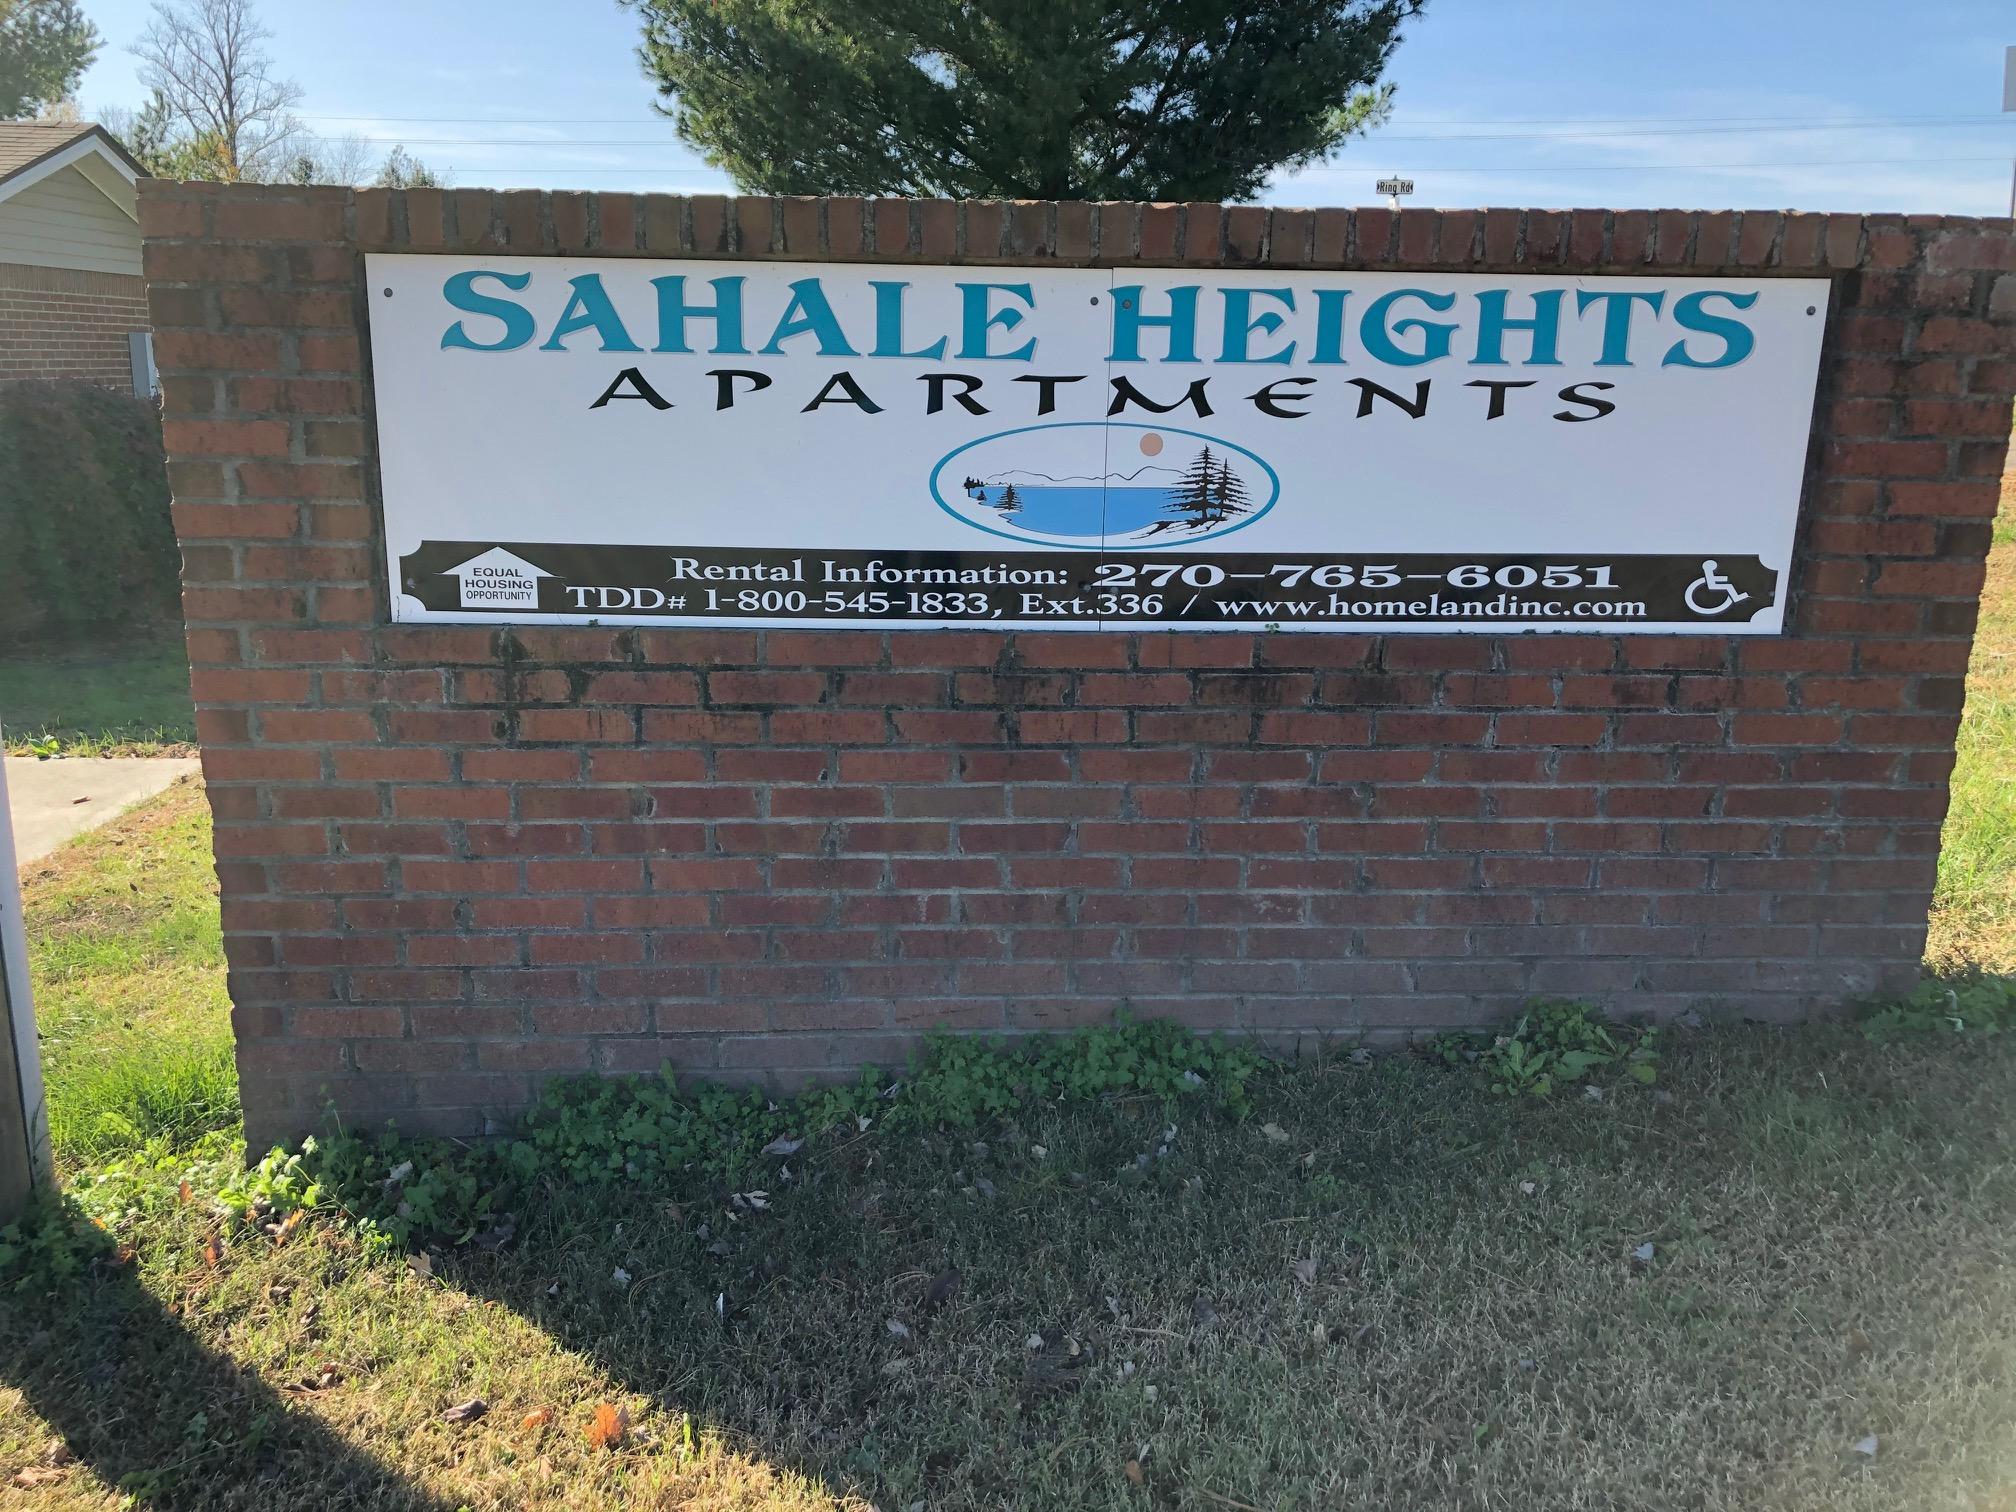 Sahale Heights Apartments